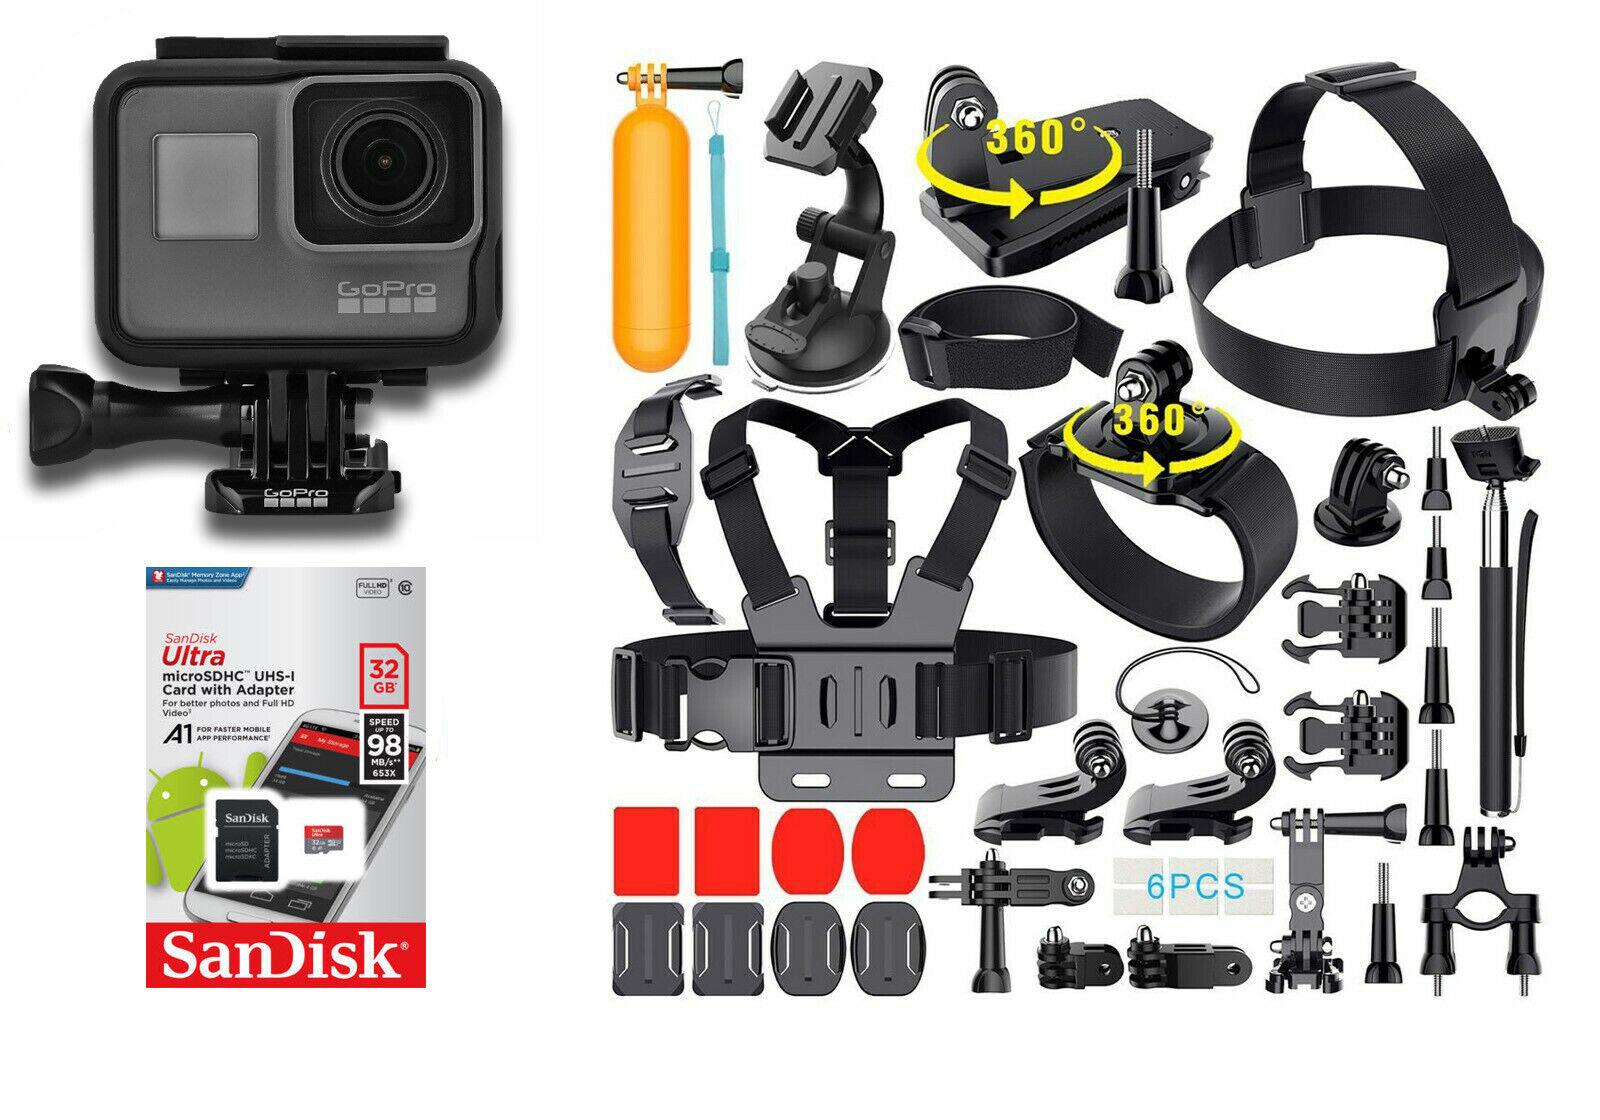 GoPro - HERO6 Black 4K Action Camera -  CHDHX-601 [40+] Sports Accessories accessories action black camera gopro hero6 sports